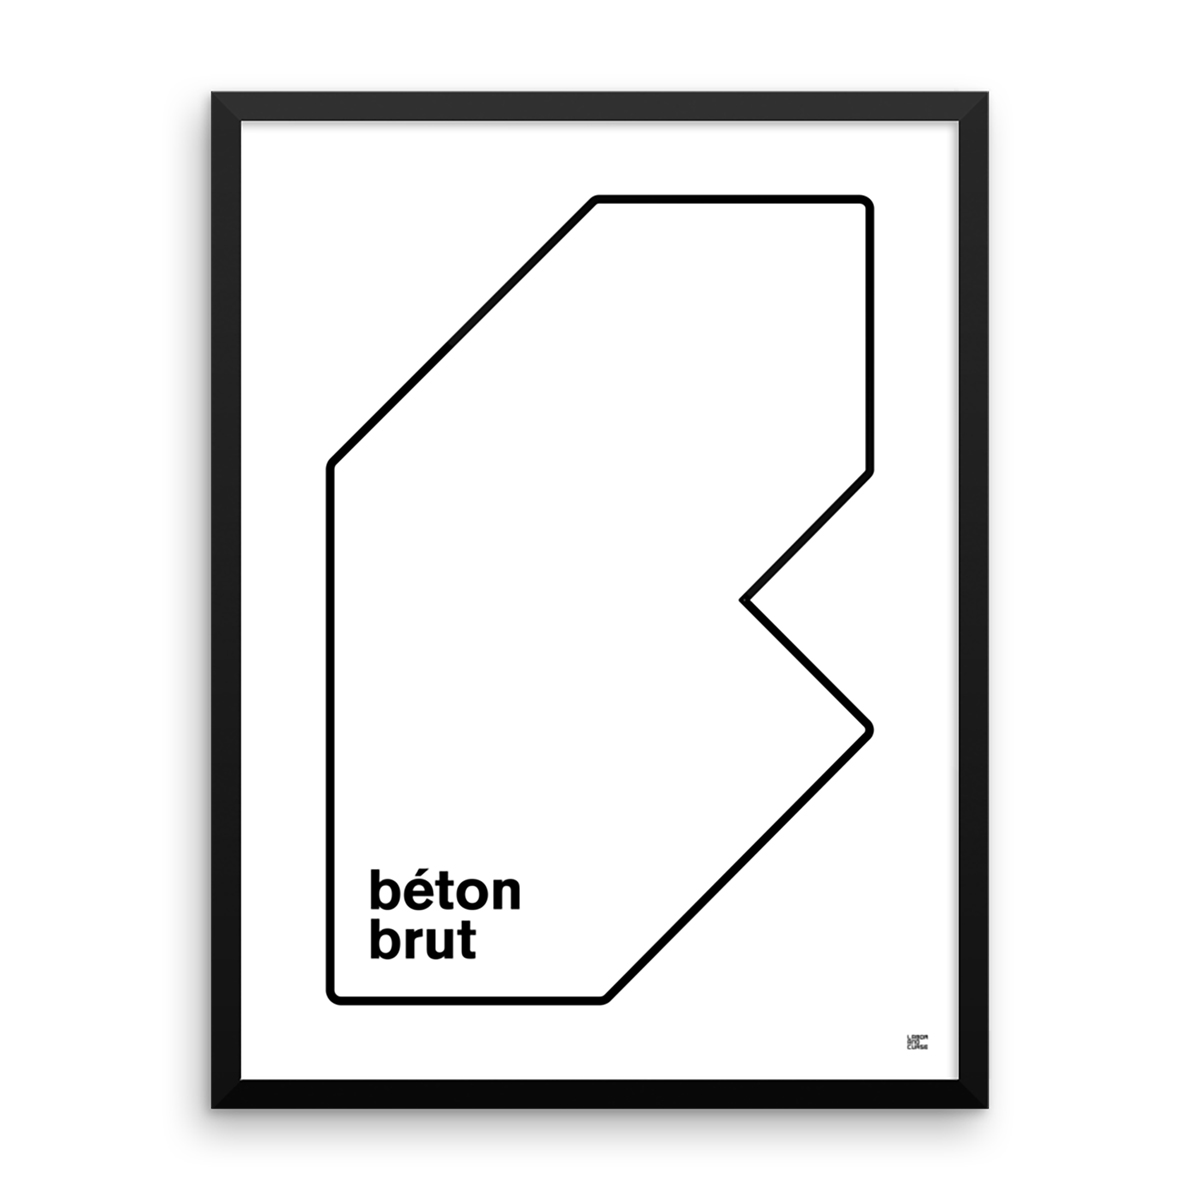 b ton brut poster labor and curse. Black Bedroom Furniture Sets. Home Design Ideas